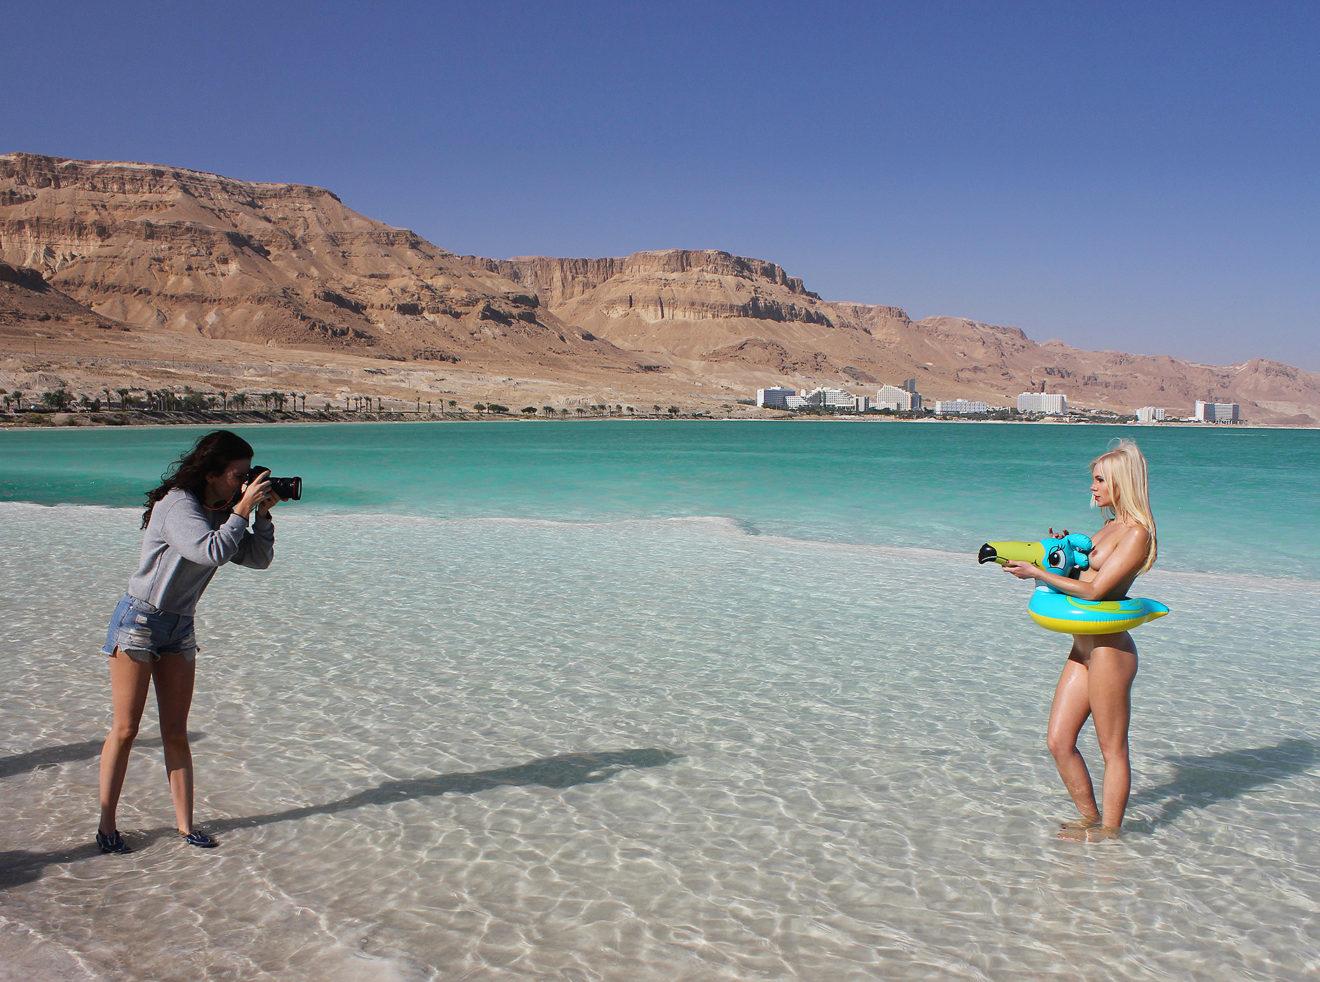 Ana Dias shooting Dasha Snezhnaya for Playboy, behind the scenes